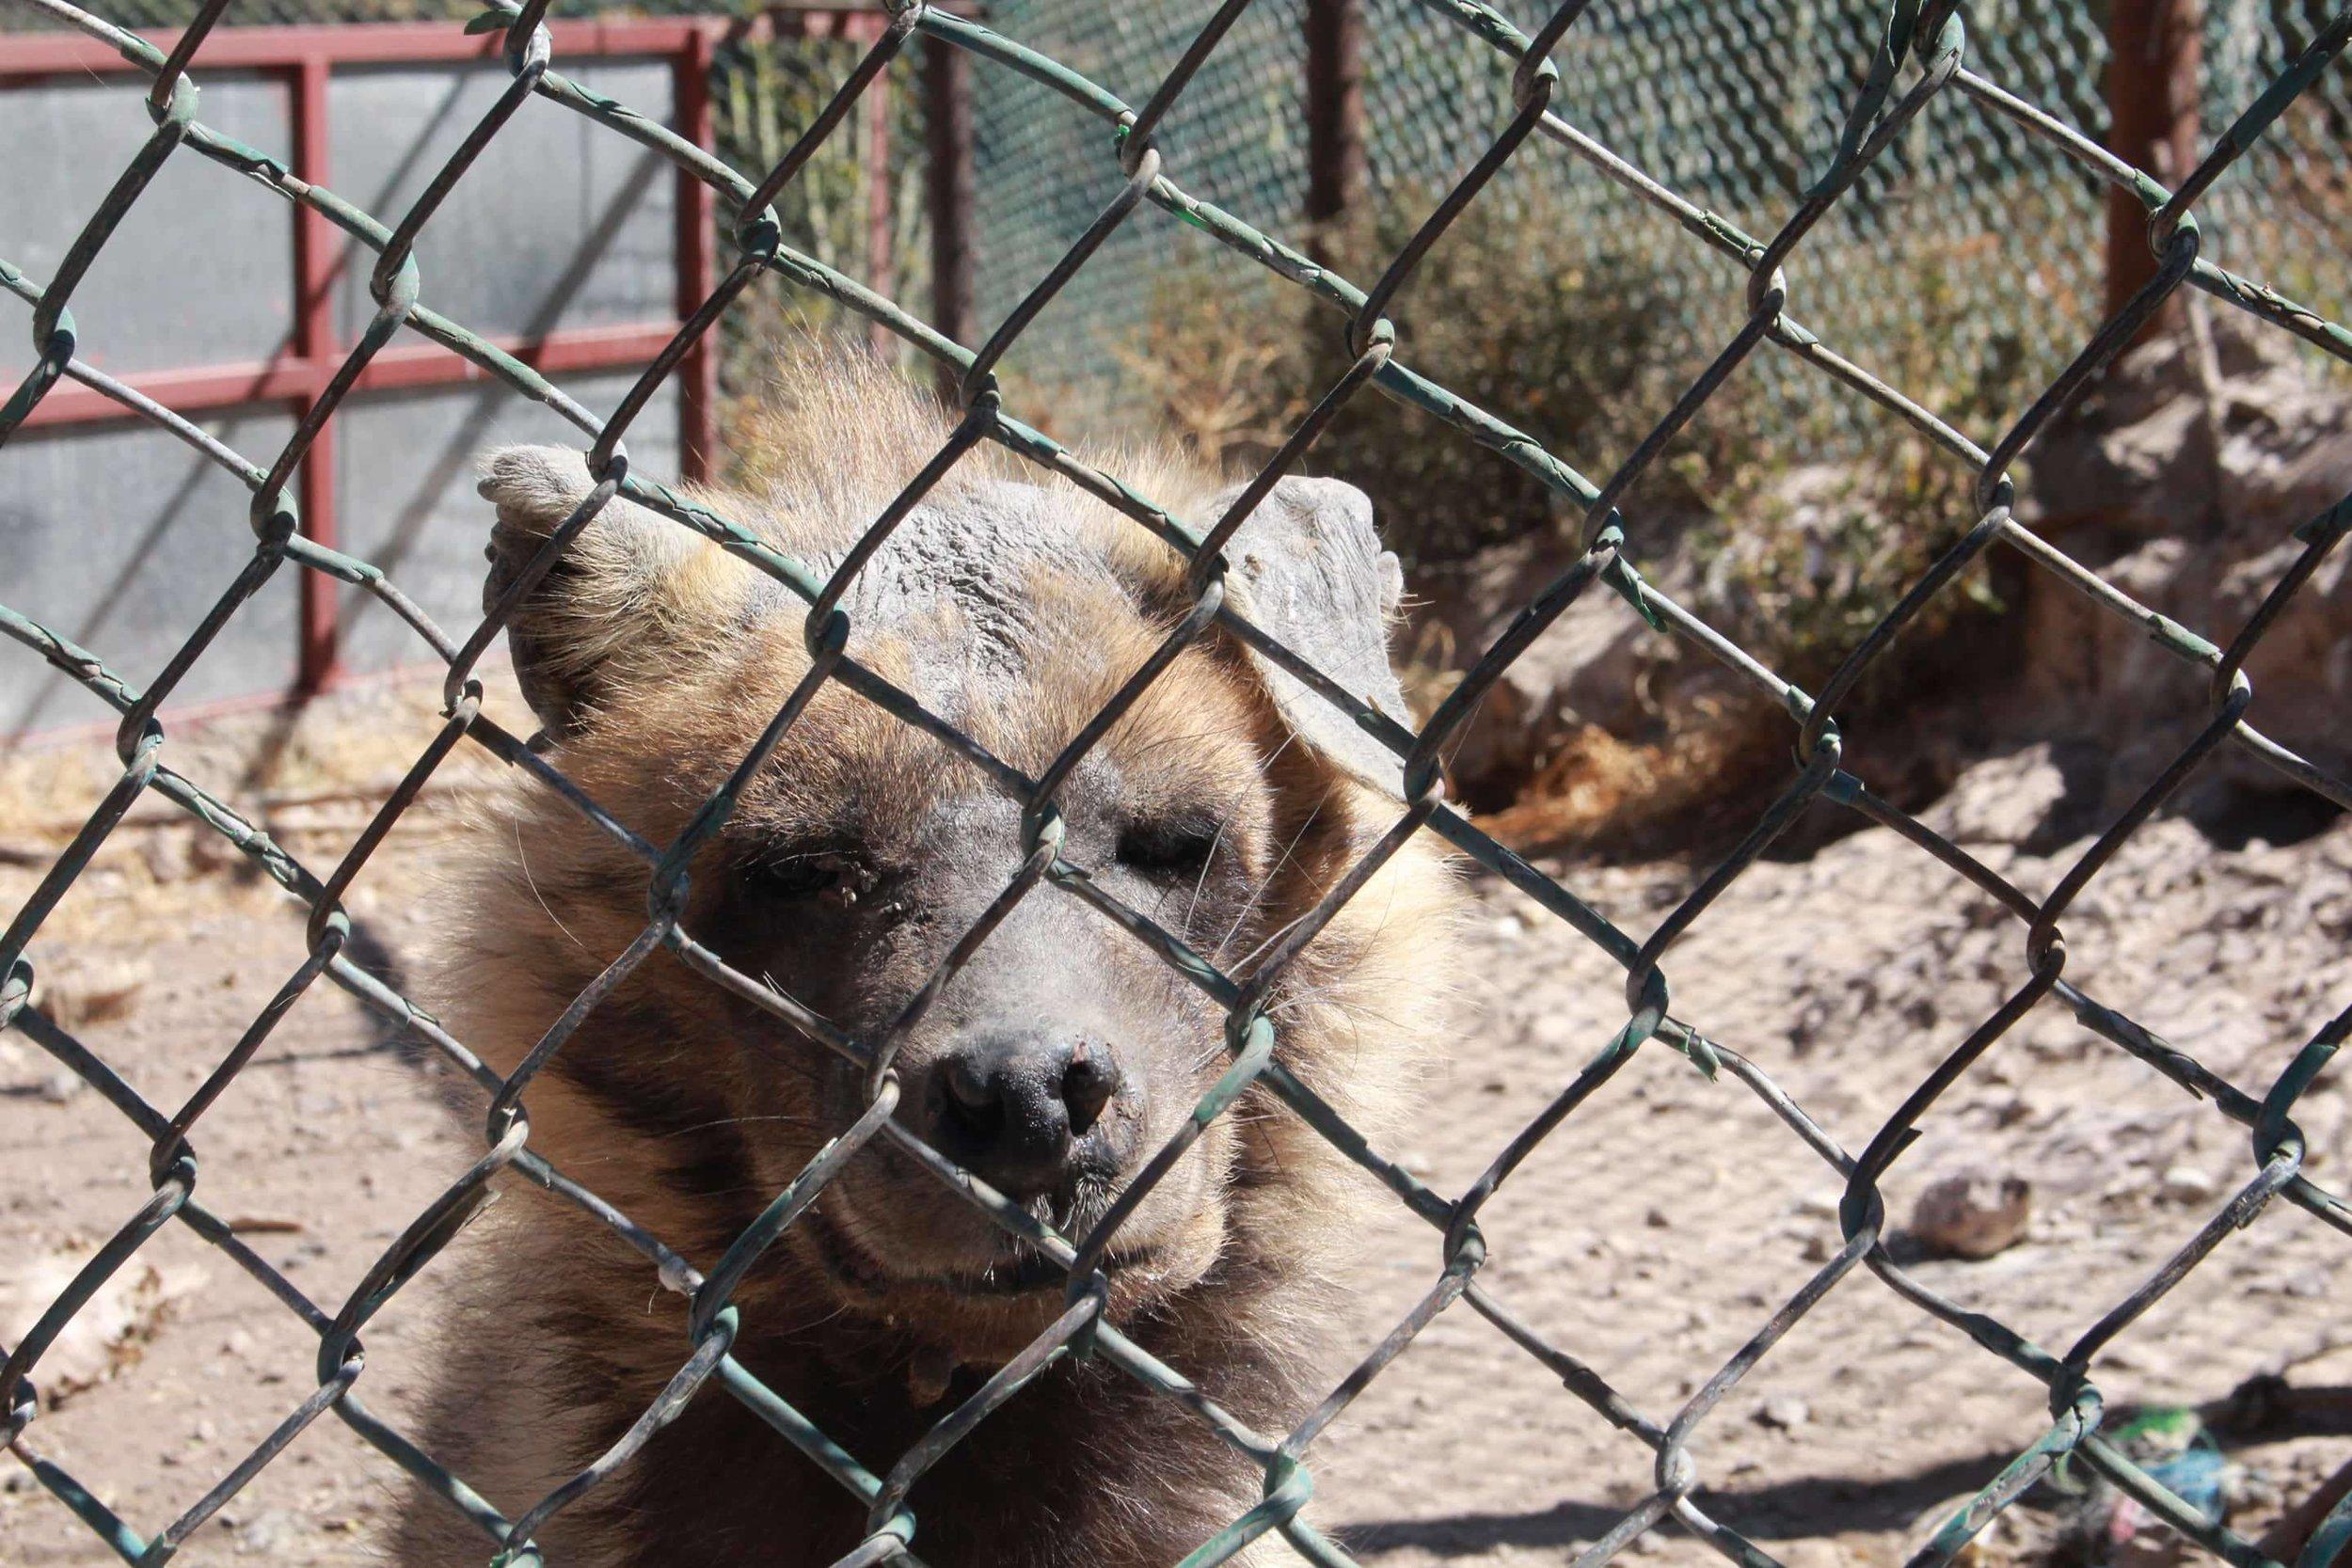 ibb zoo bella our bullied little striped hyena yemen 20 DEC 2017 pics by salman.jpg